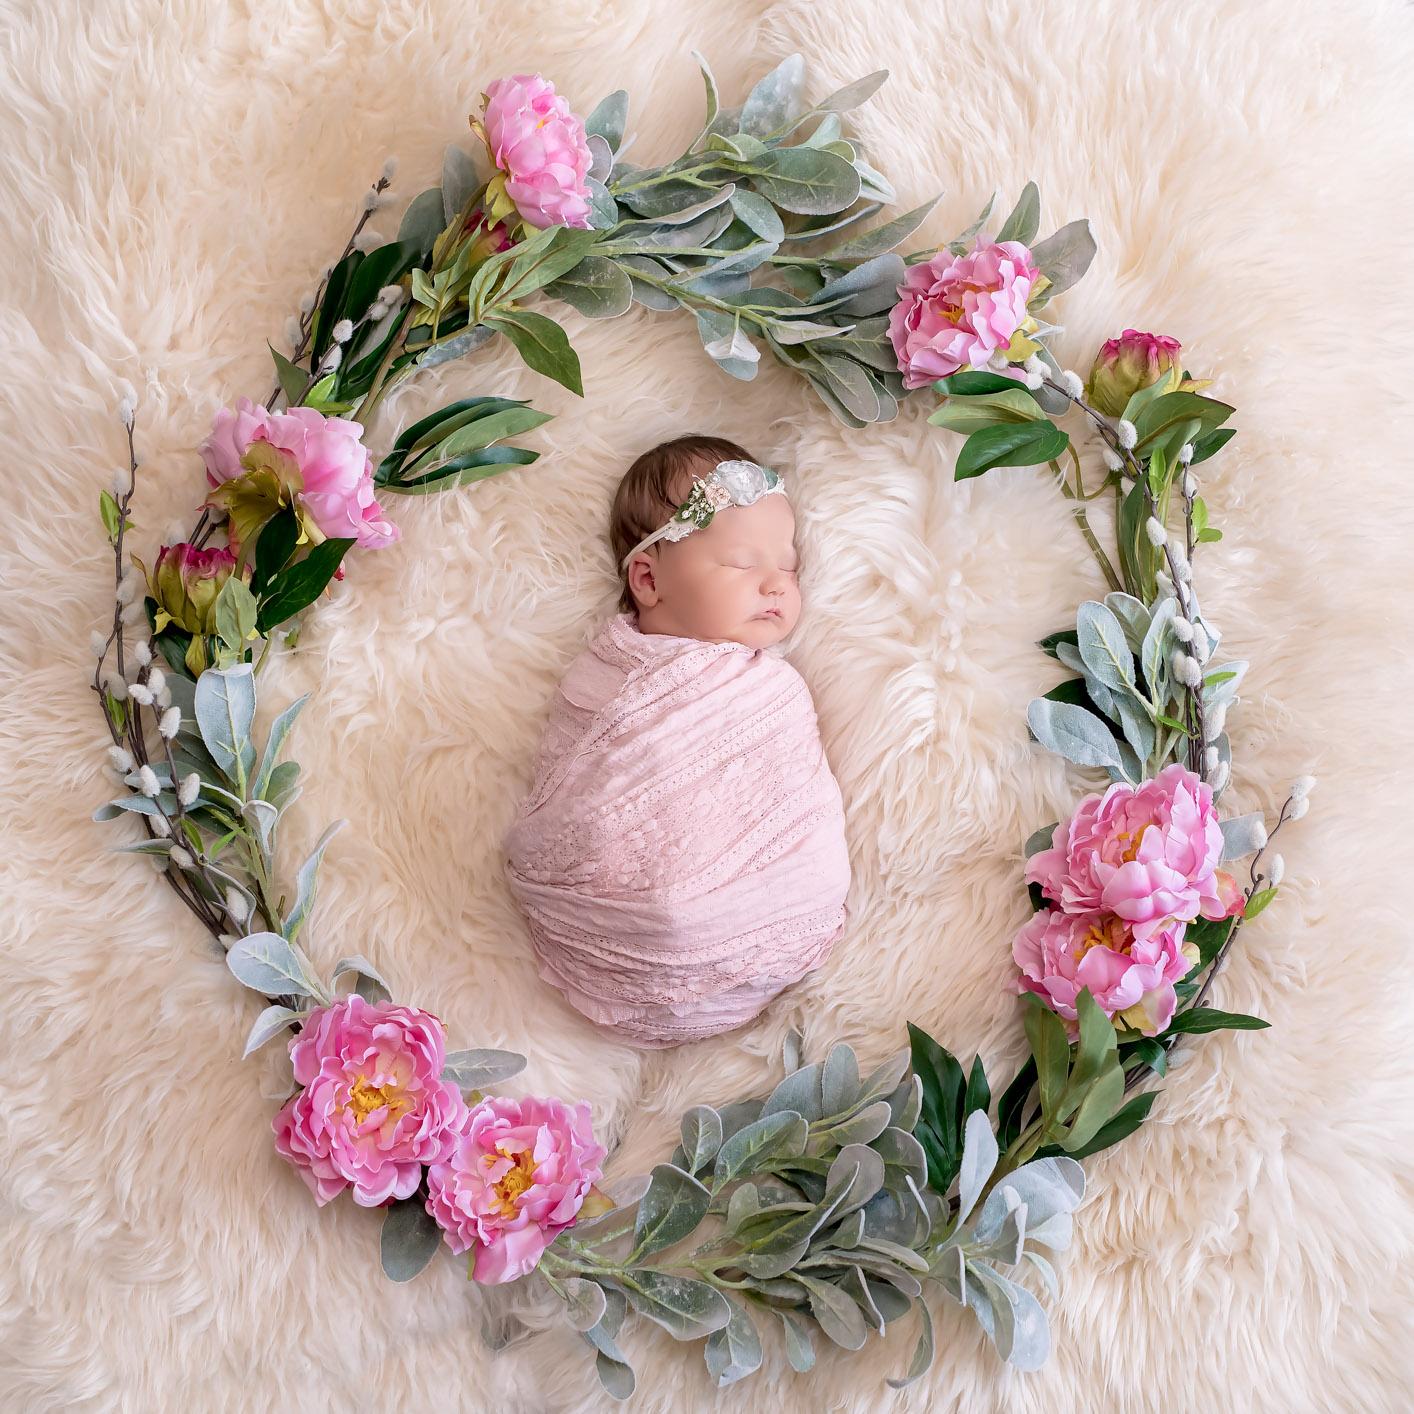 Baby EvelynDSC_6886-Edit.jpg